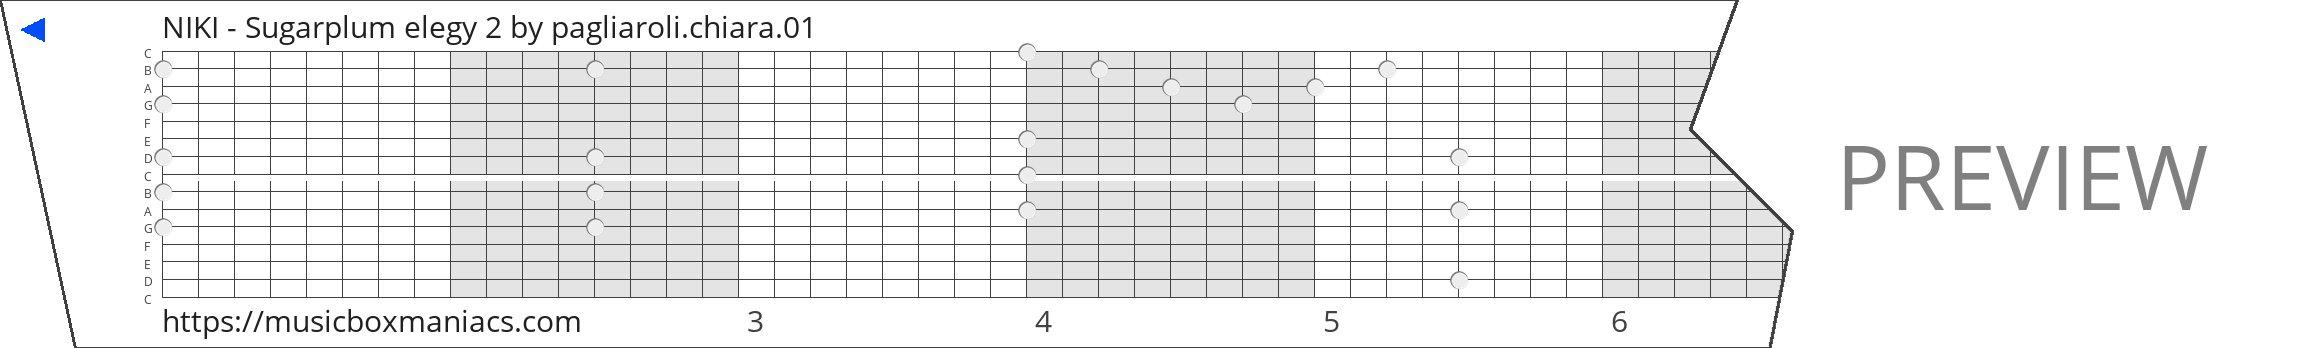 NIKI - Sugarplum elegy 2 15 note music box paper strip